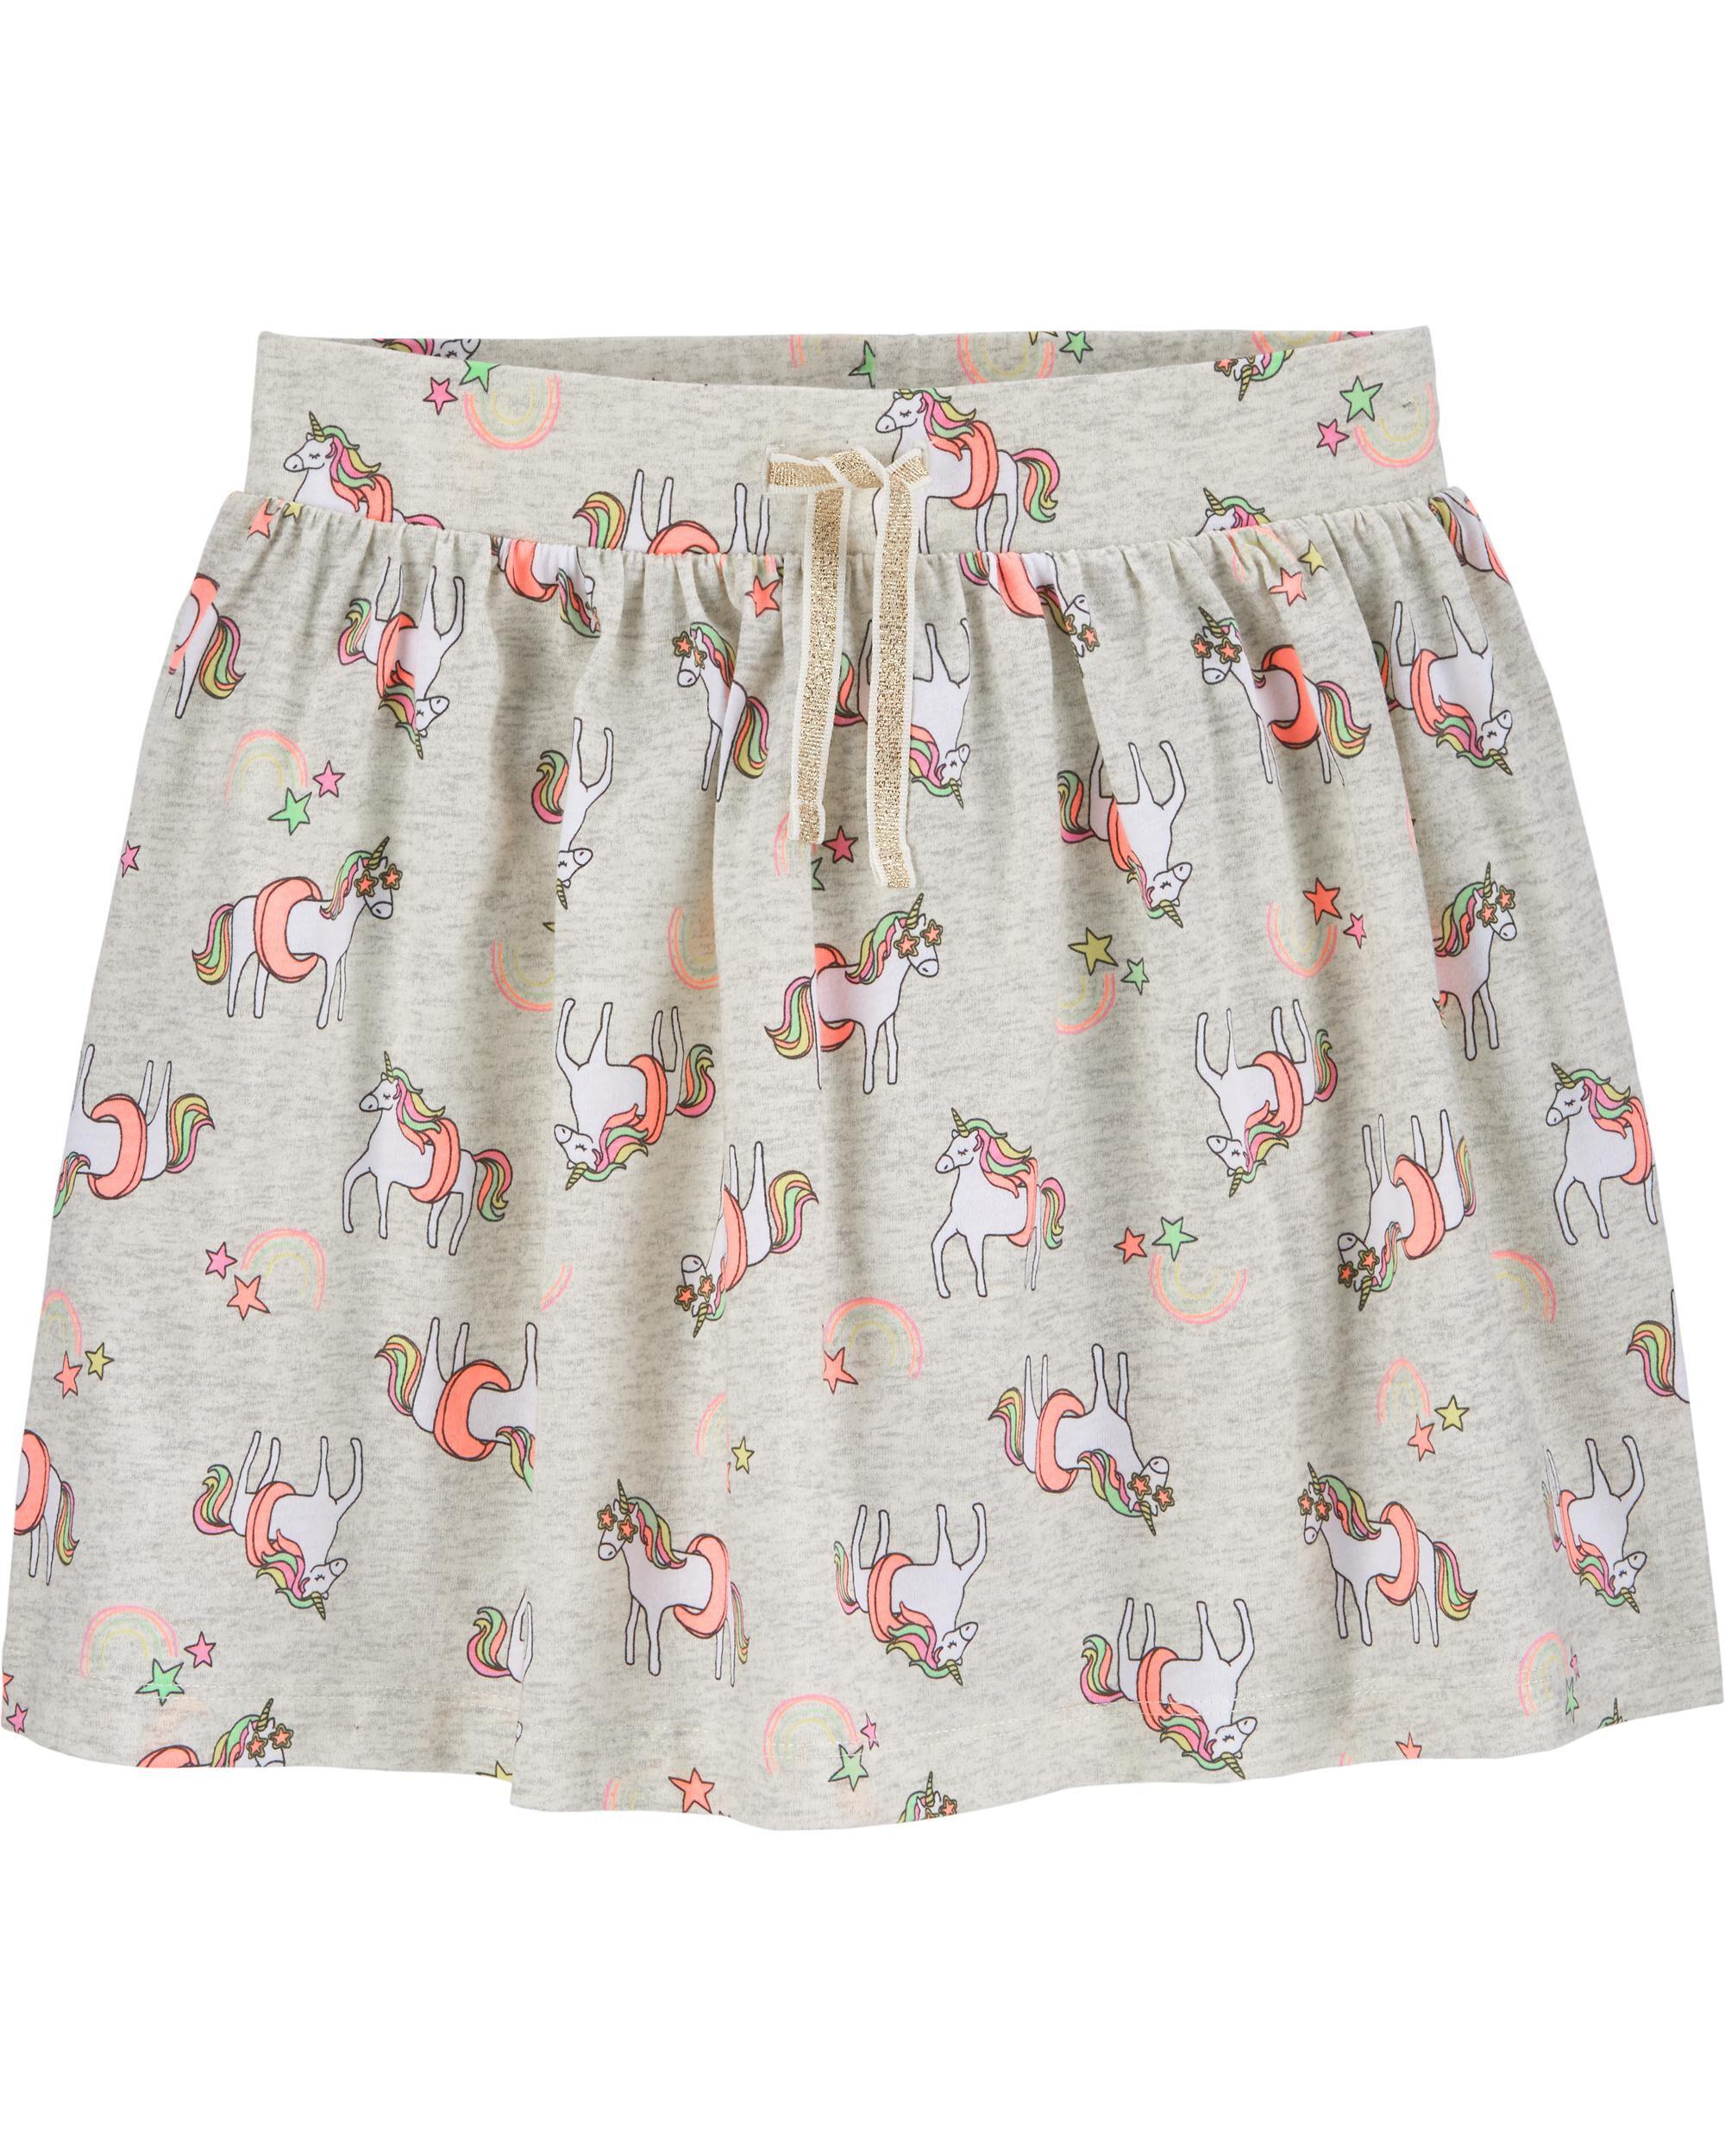 *CLEARANCE* Unicorn Skooter Skirt